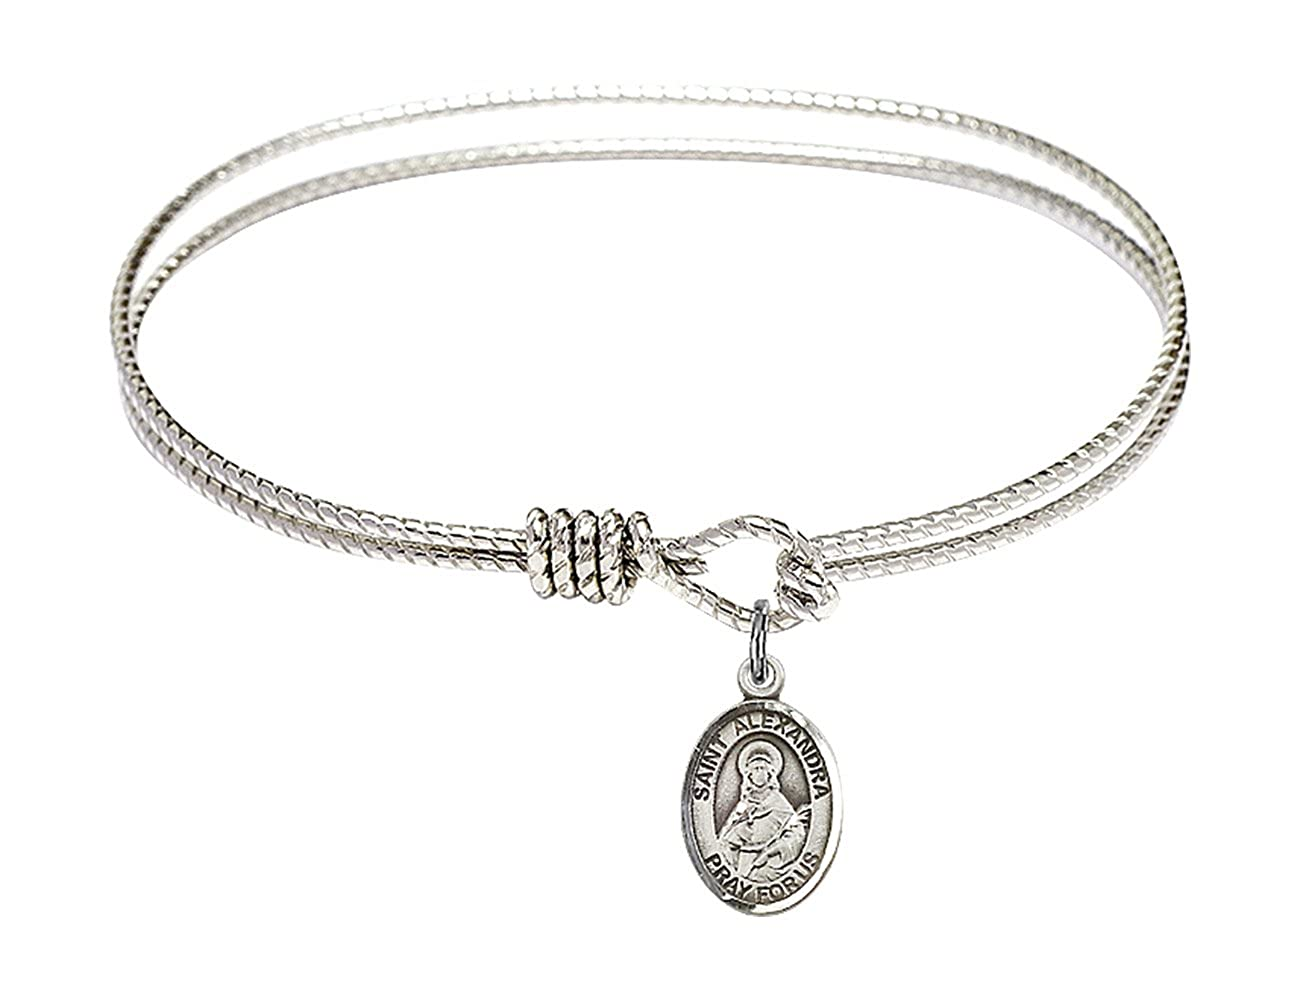 Alexandra Charm. DiamondJewelryNY Eye Hook Bangle Bracelet with a St